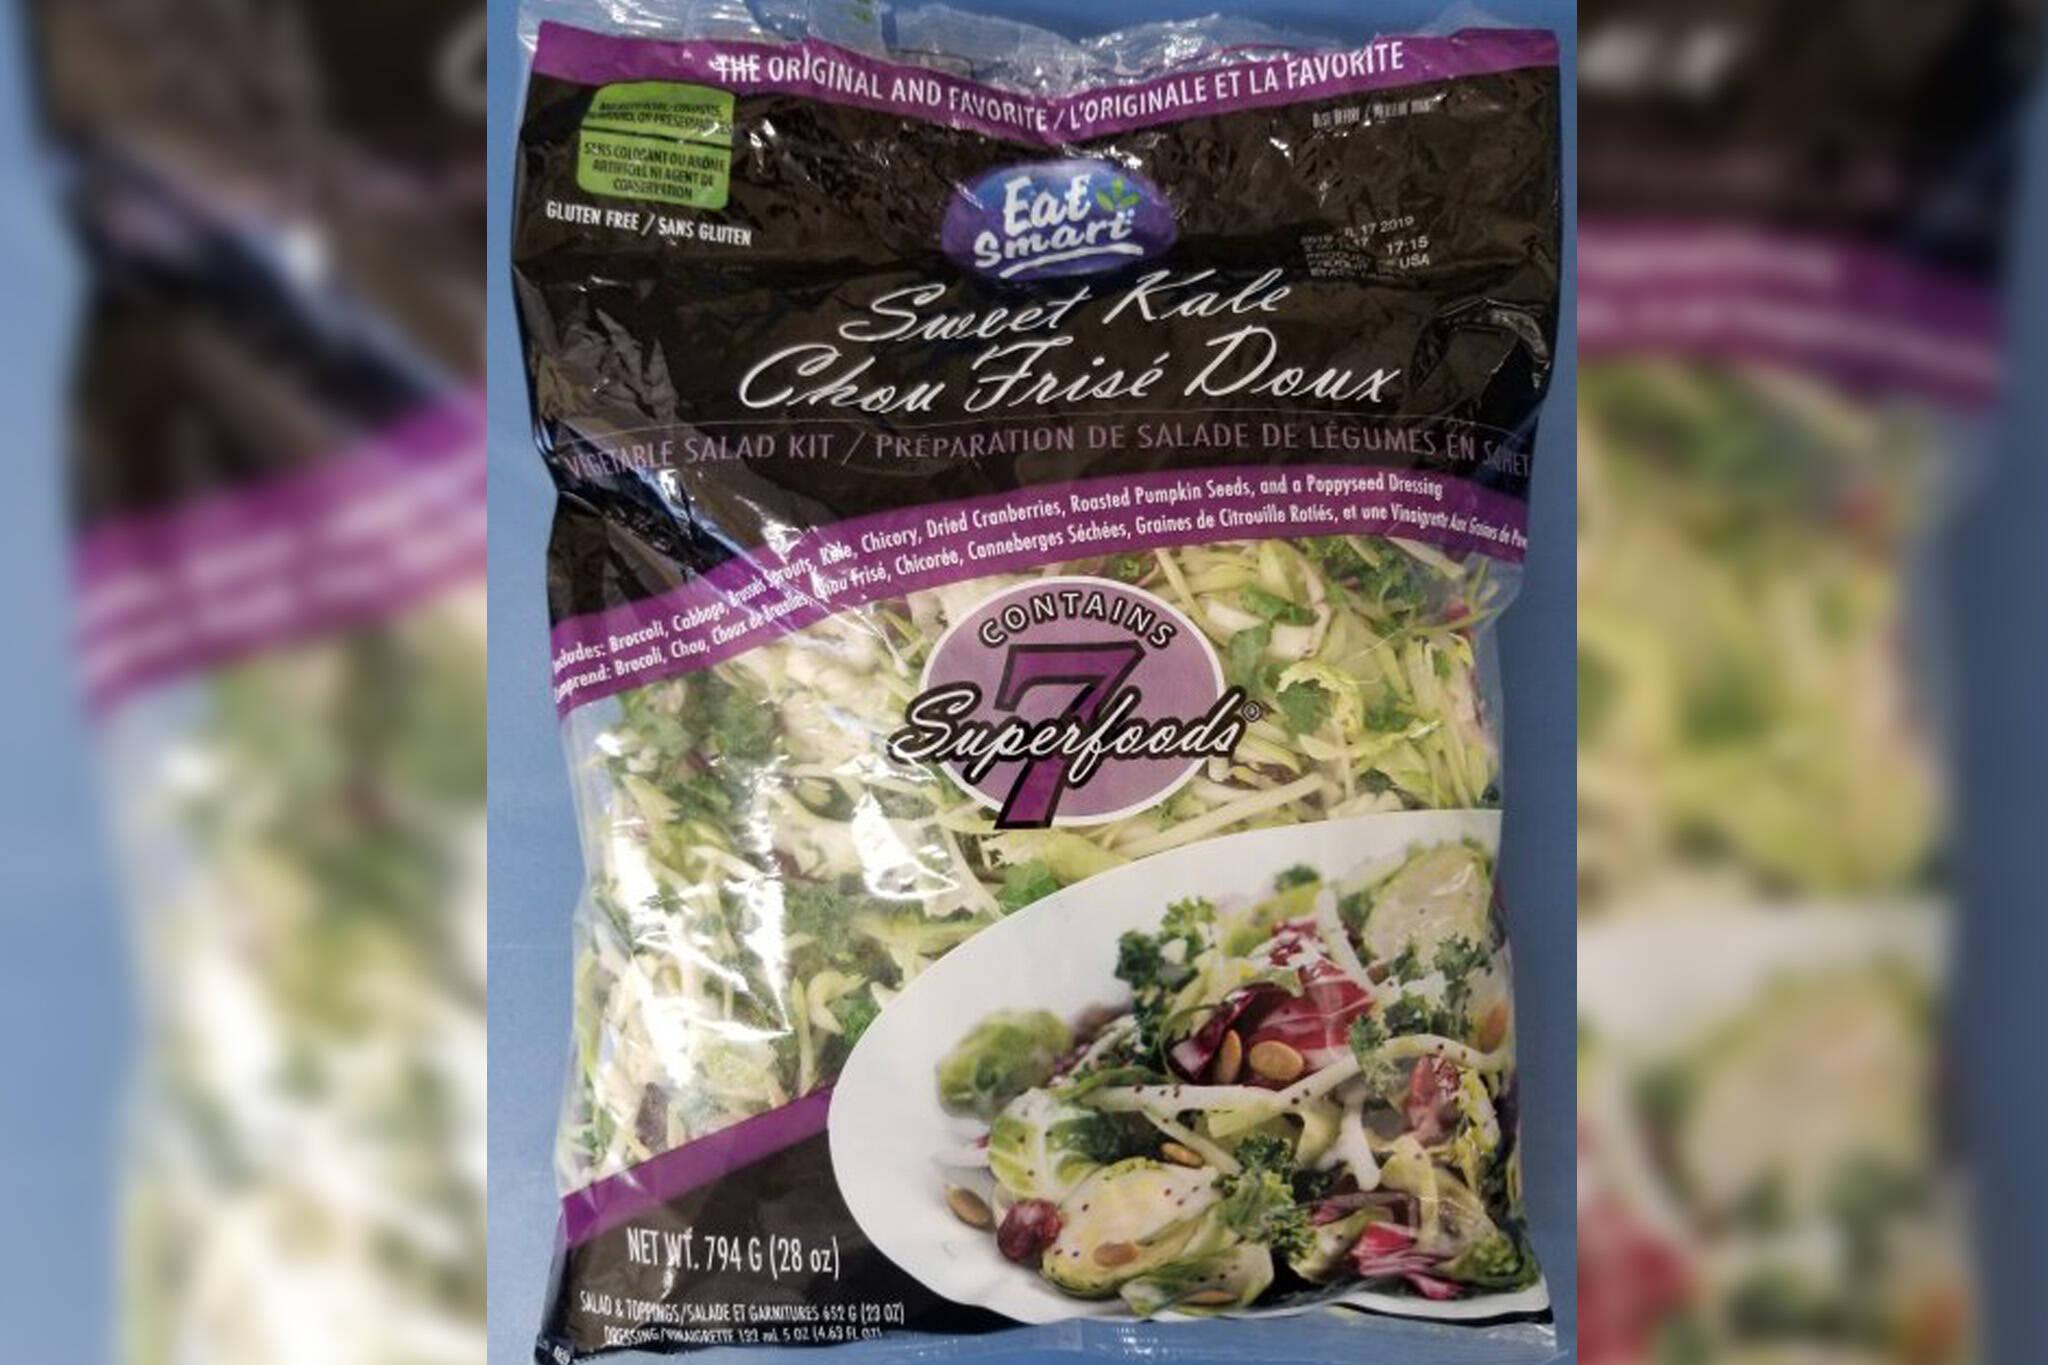 kale salad recall listeria